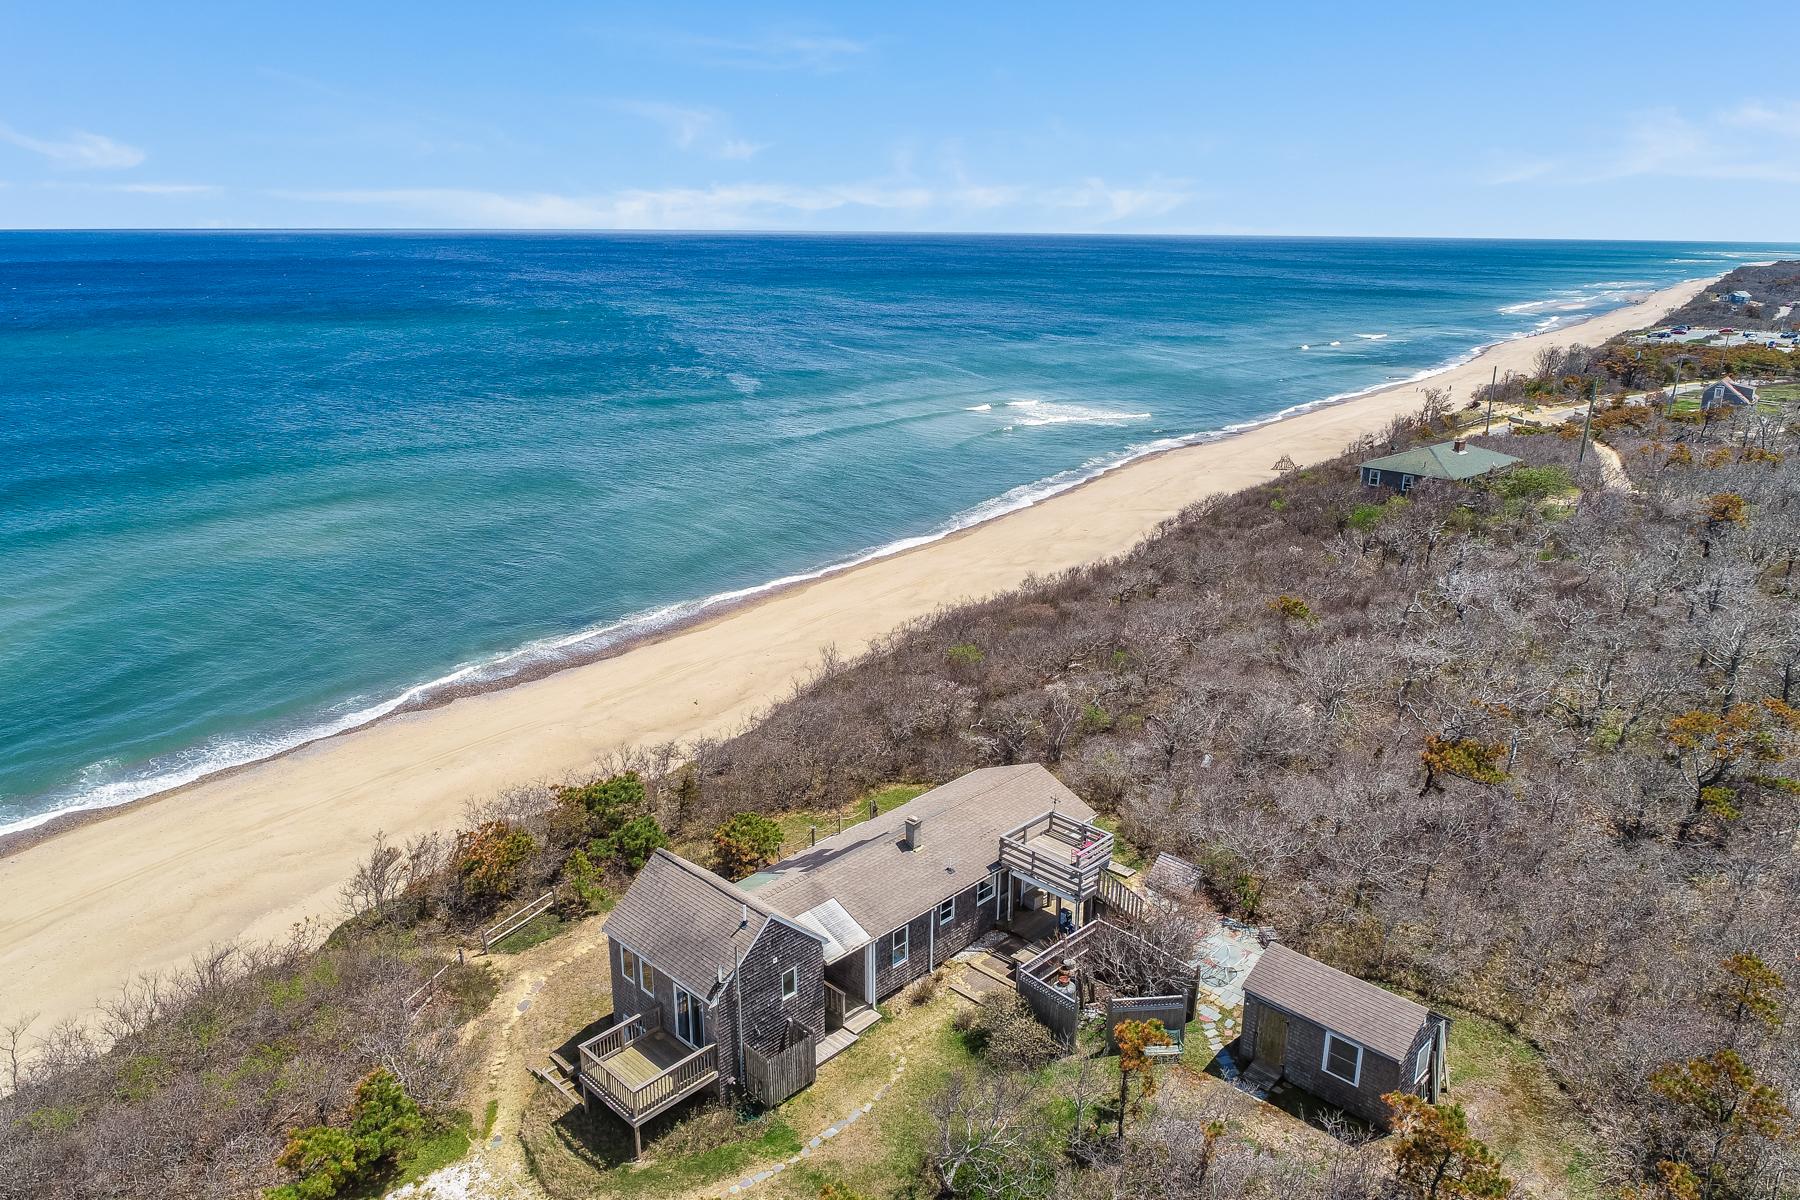 Single Family Homes για την Πώληση στο 245 Nauset Light Beach Road, Eastham 245 Nauset Light Beach Rd, Eastham, Μασαχουσετη 02642 Ηνωμένες Πολιτείες